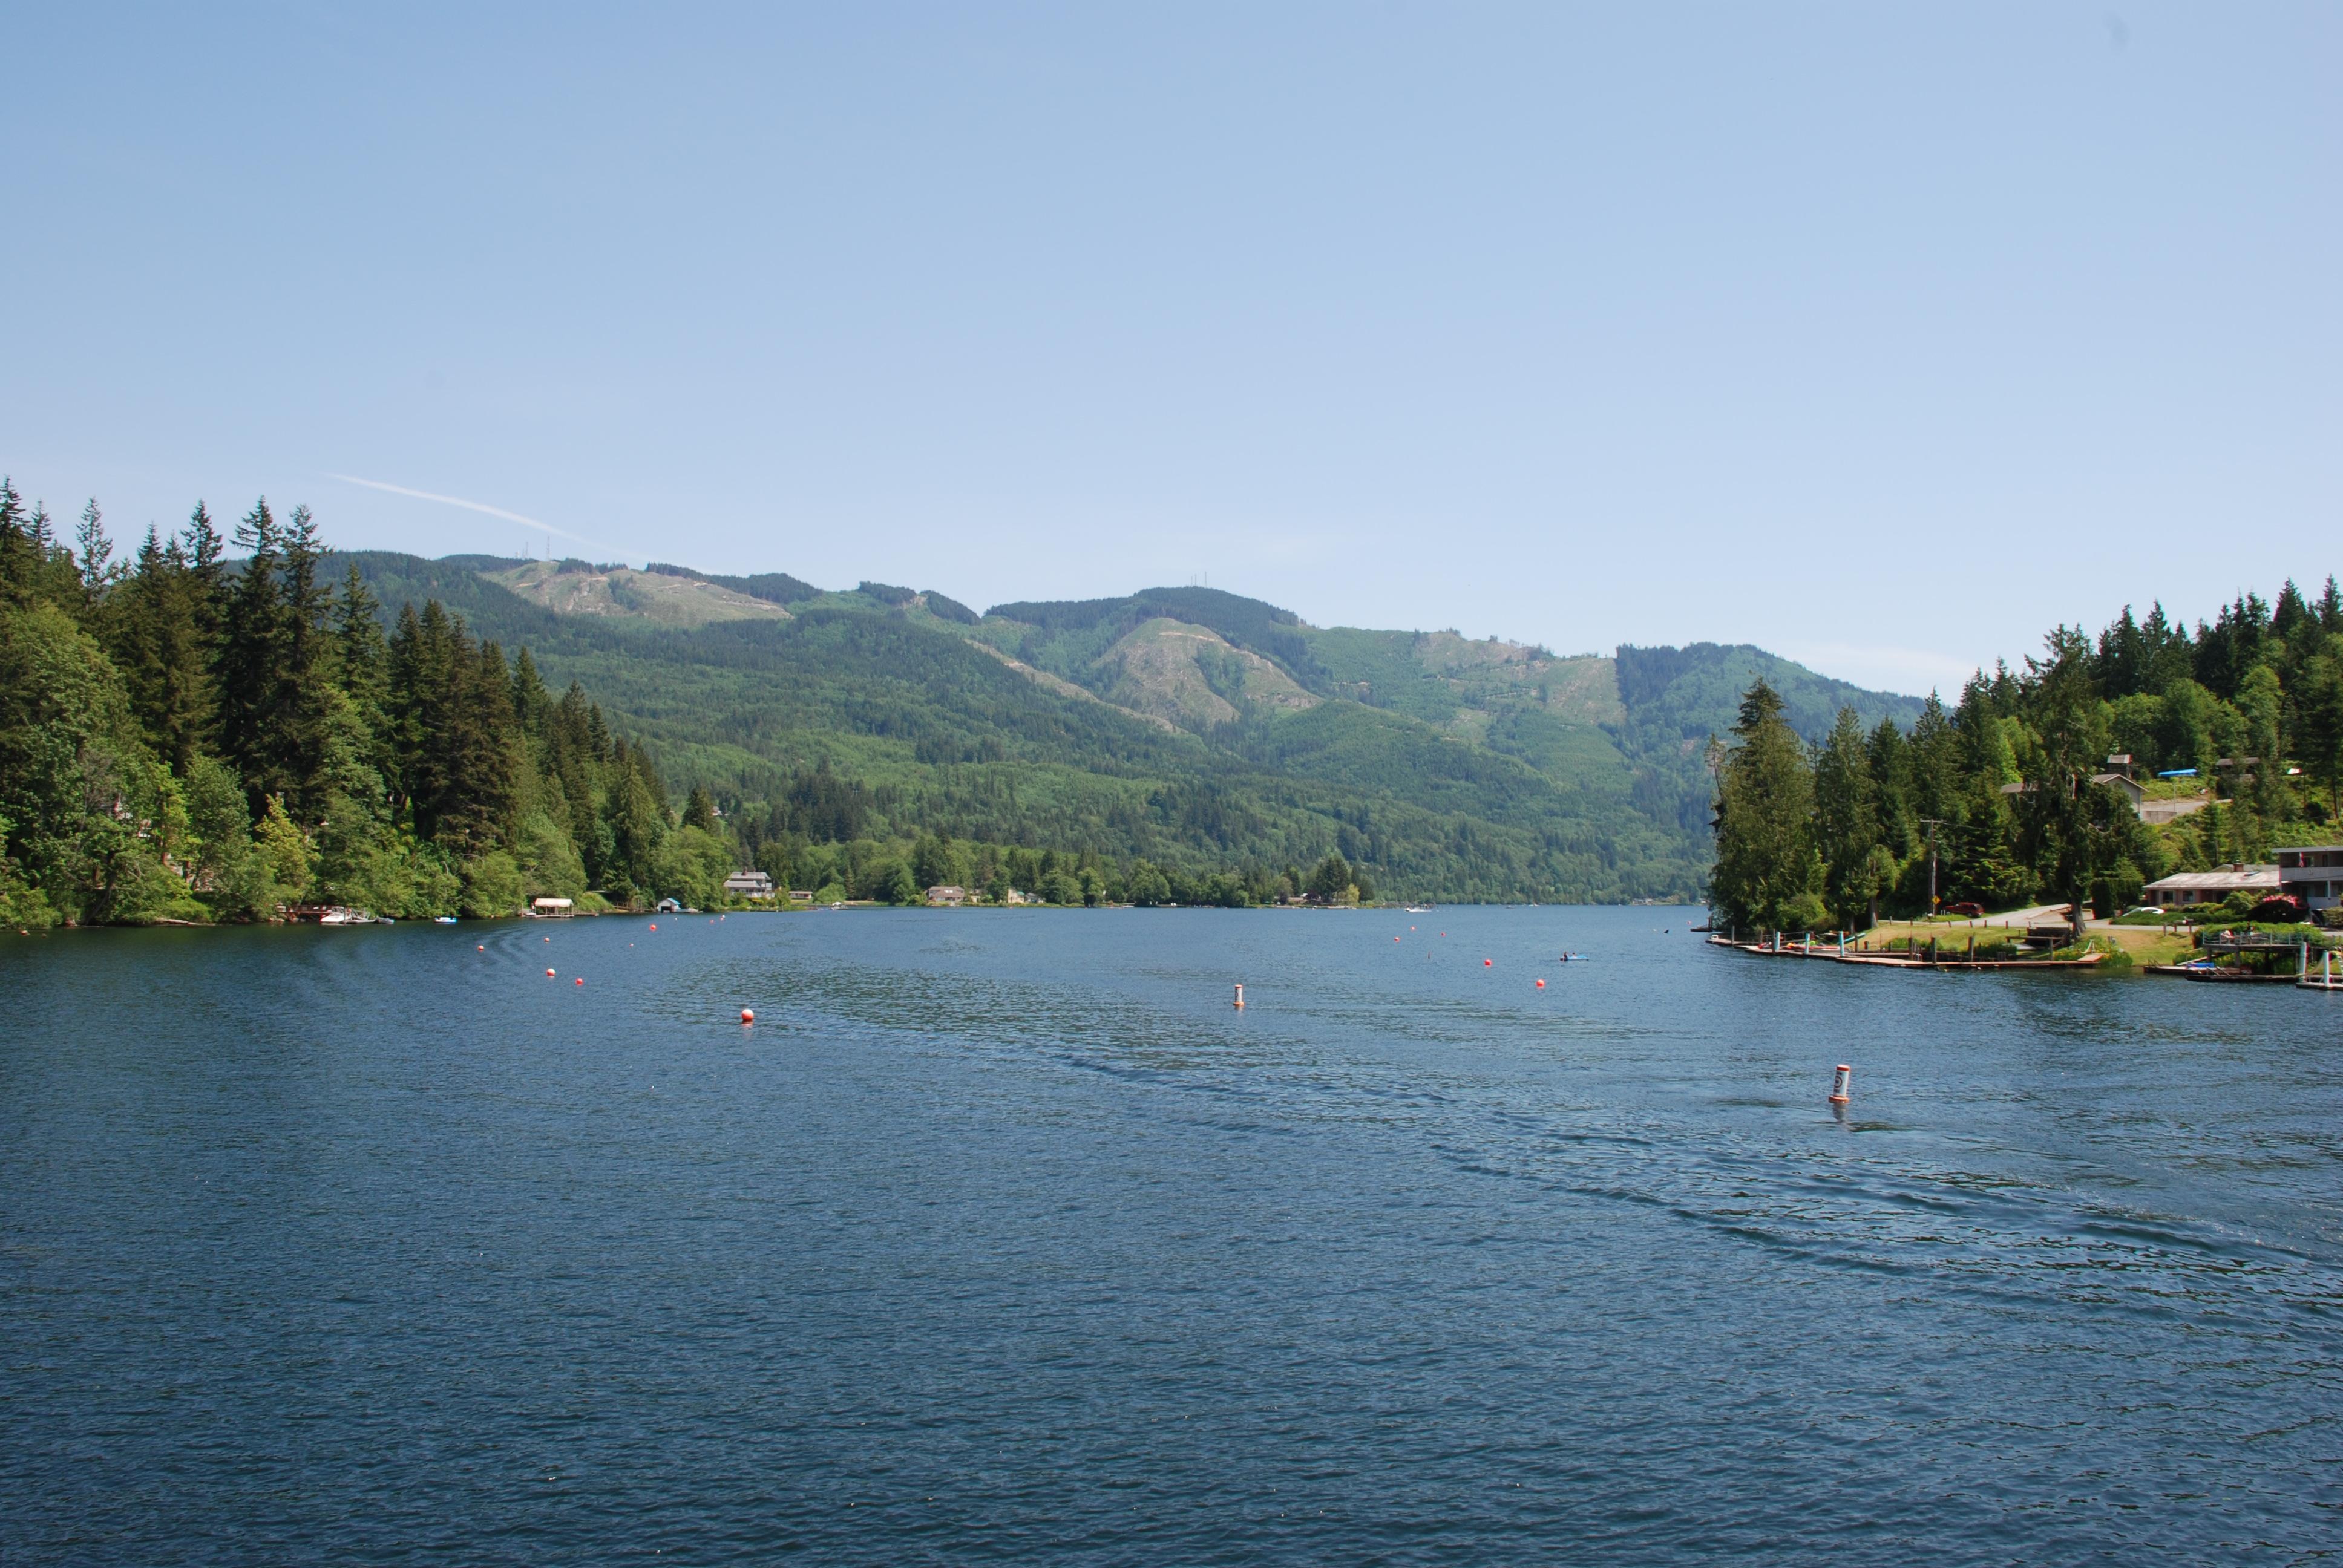 Http Www Wikiwand Com En Lake Samish